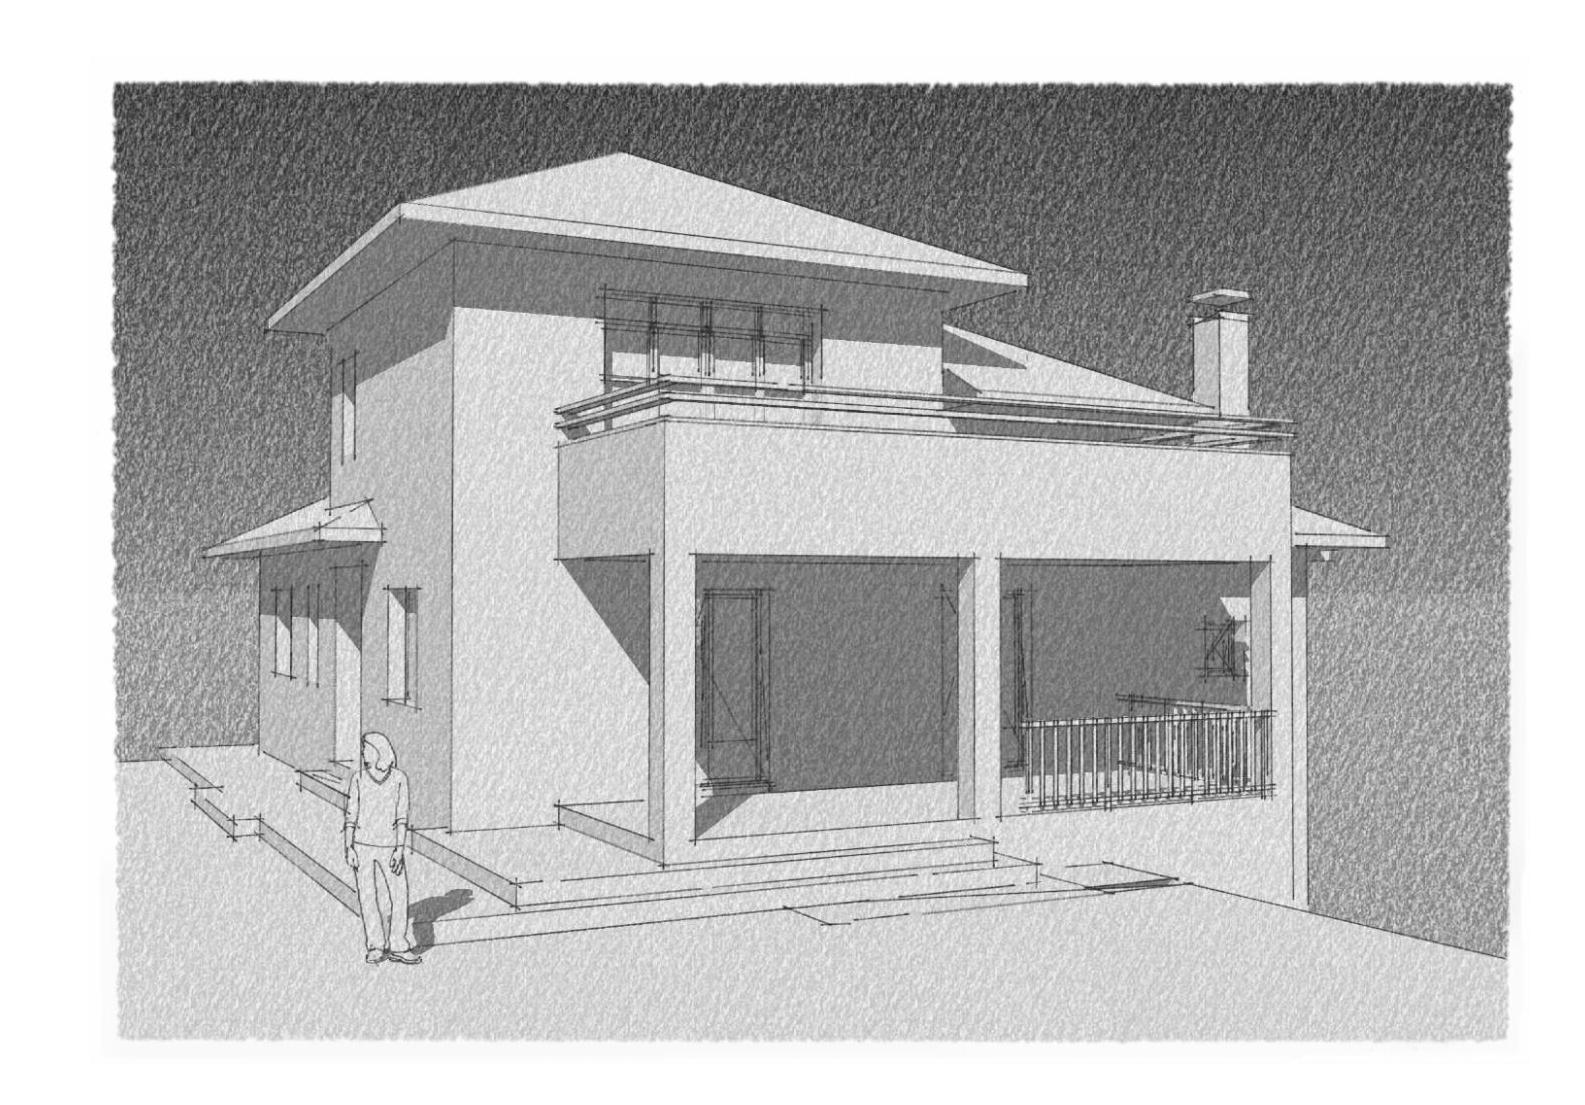 Arquitecto en cudillero asturias maque 1 arquitecto - Arquitectos asturias ...